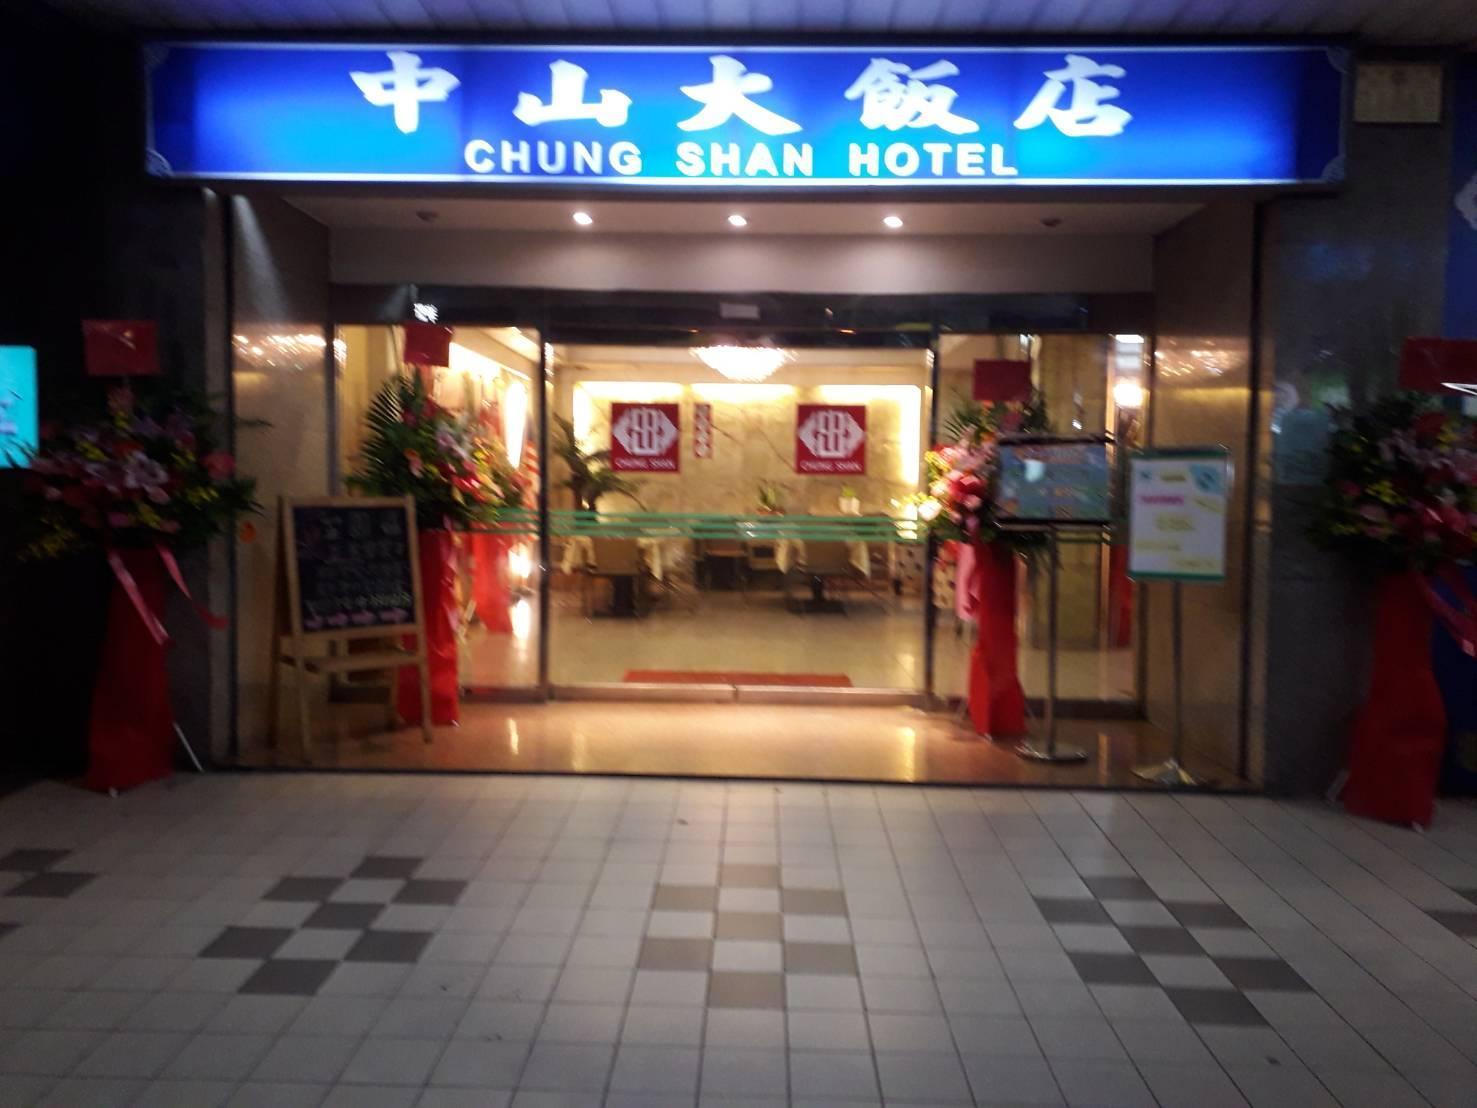 Hotel Chung Shan